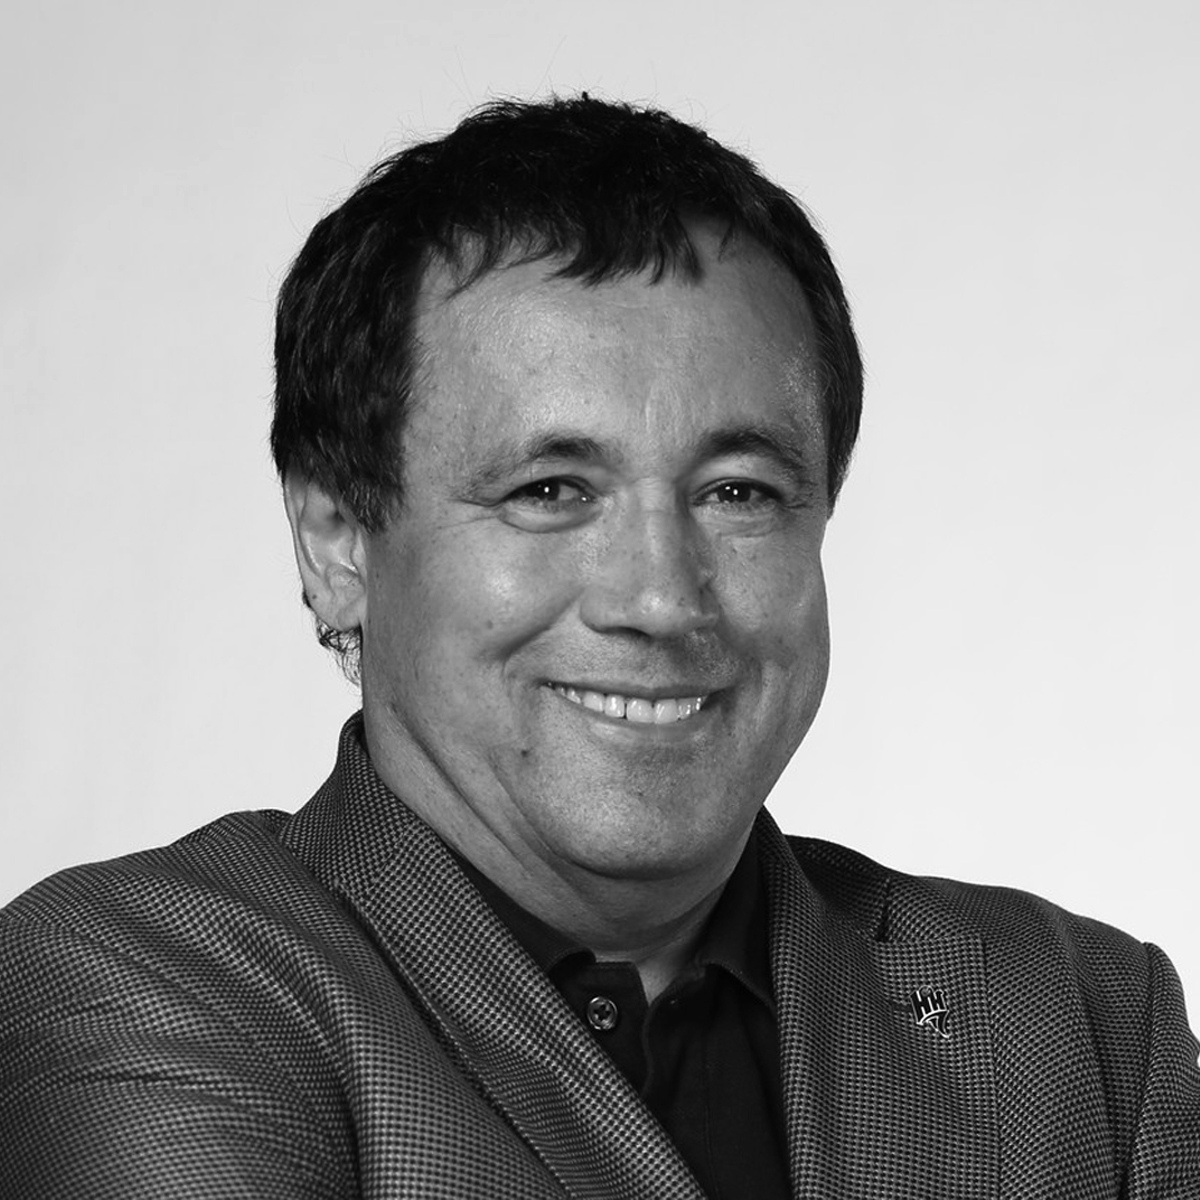 Скончался гендиректор баскетбольного клуба «Нижний Новгород» Александр Хайретдинов